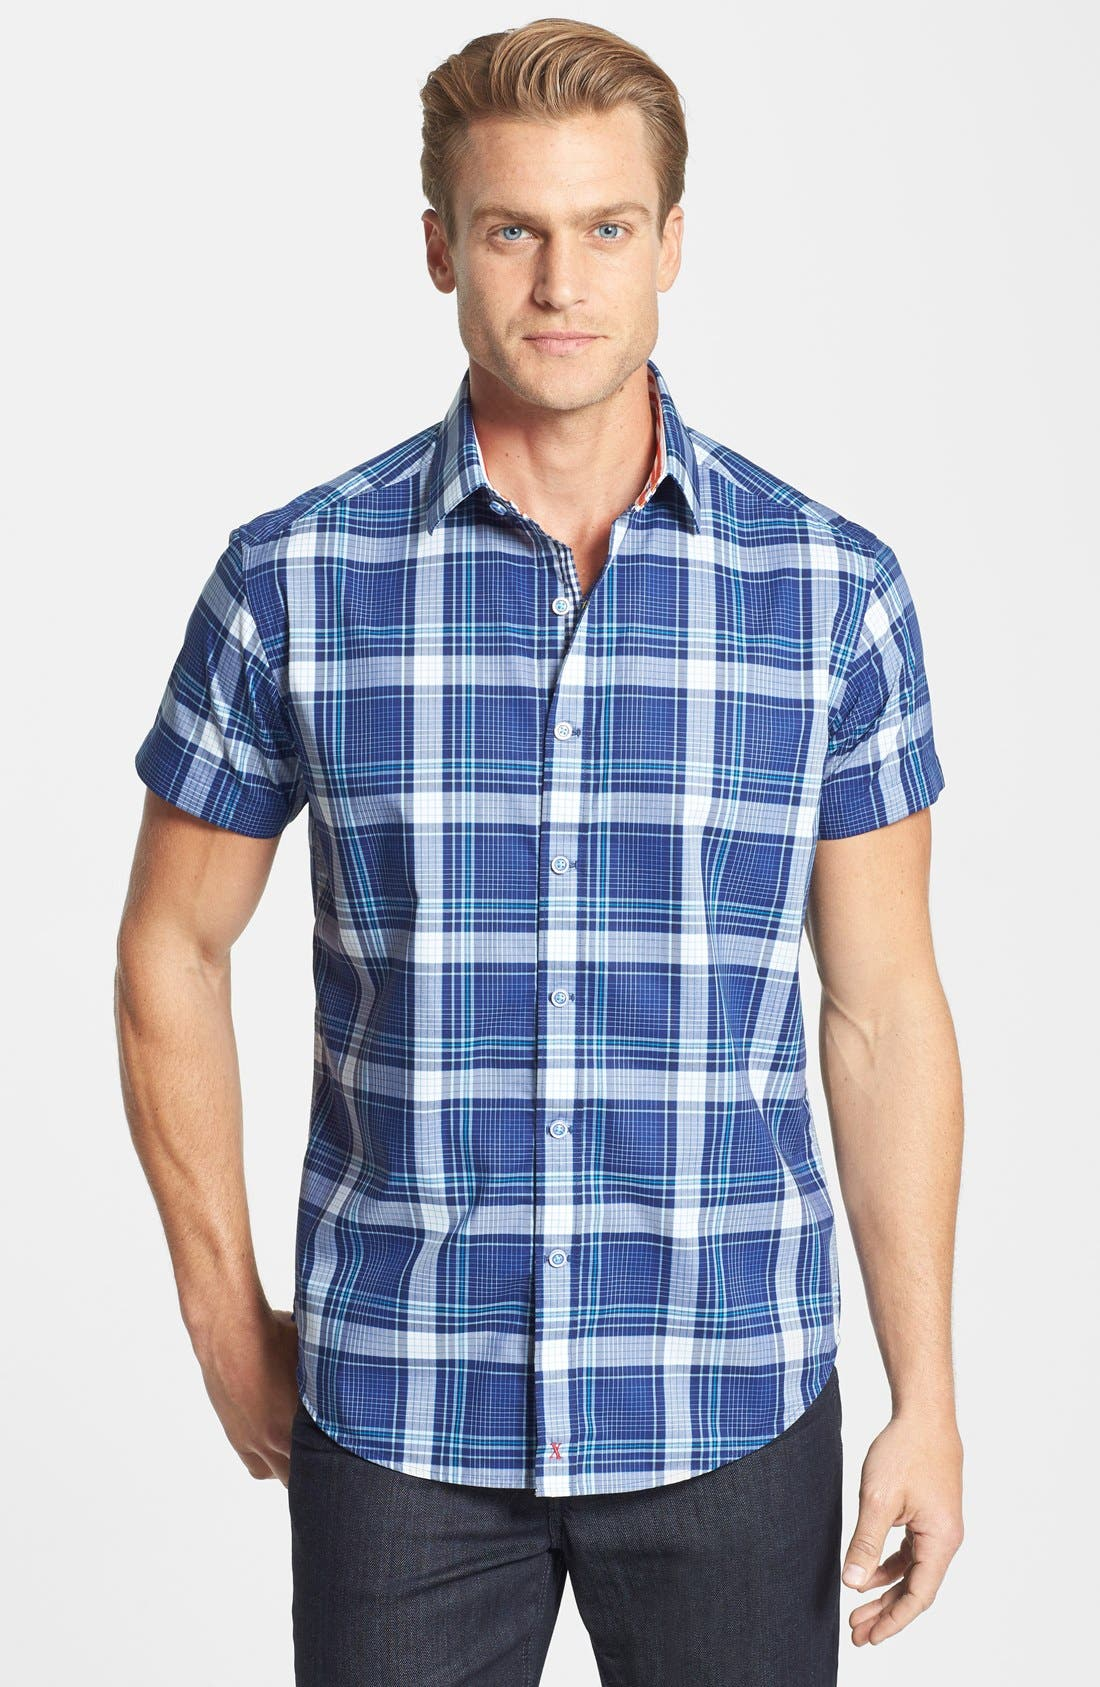 Alternate Image 1 Selected - Robert Graham 'Sandstone' Tailored Fit Cotton Short Sleeve Sport Shirt